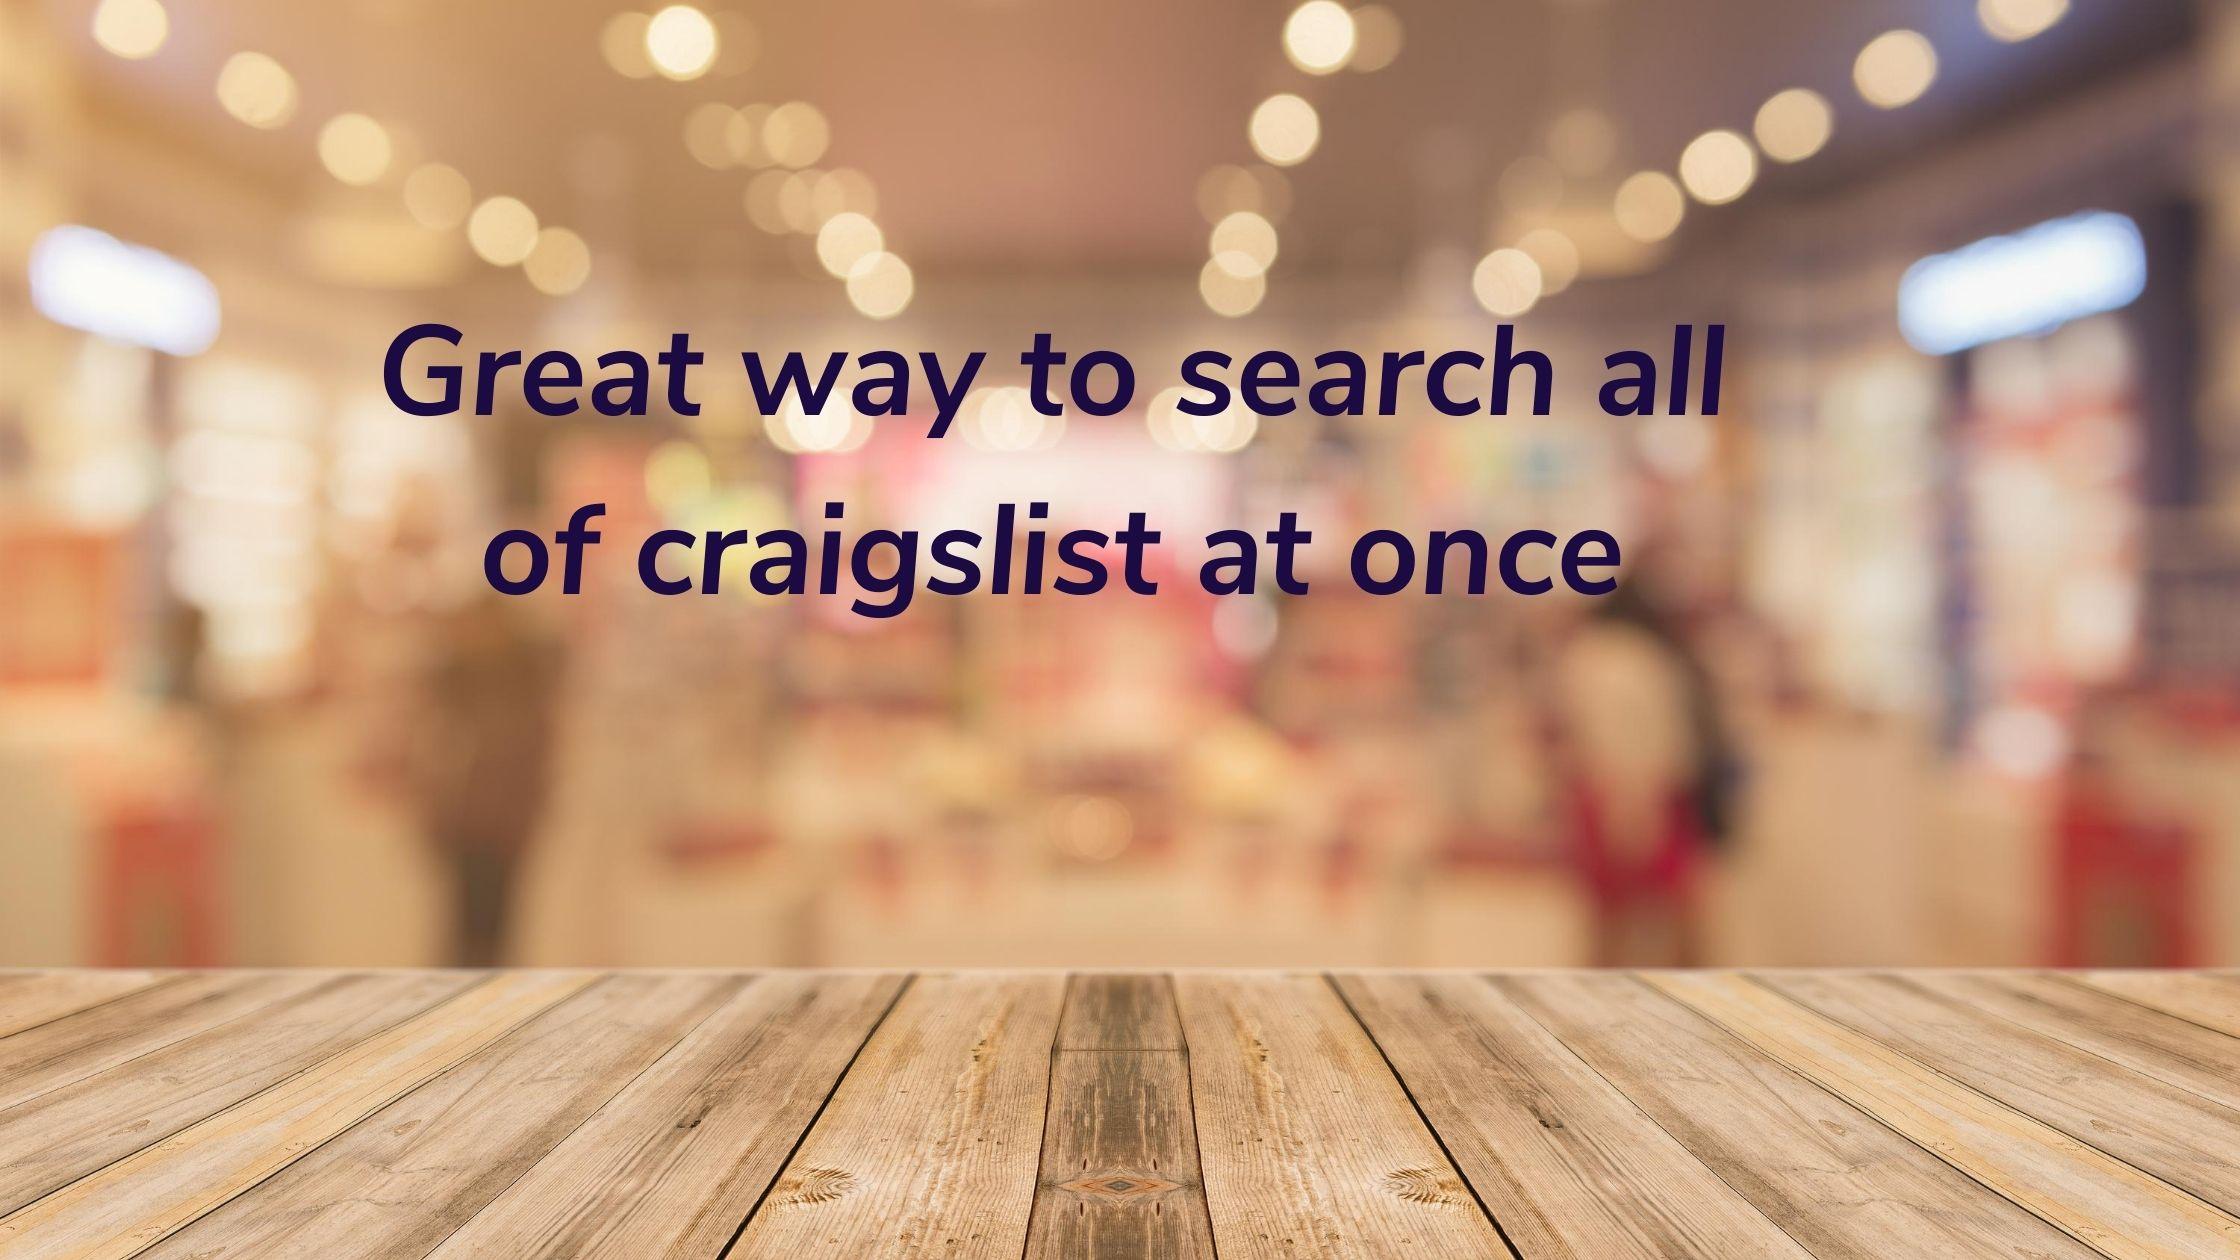 search all craigslist